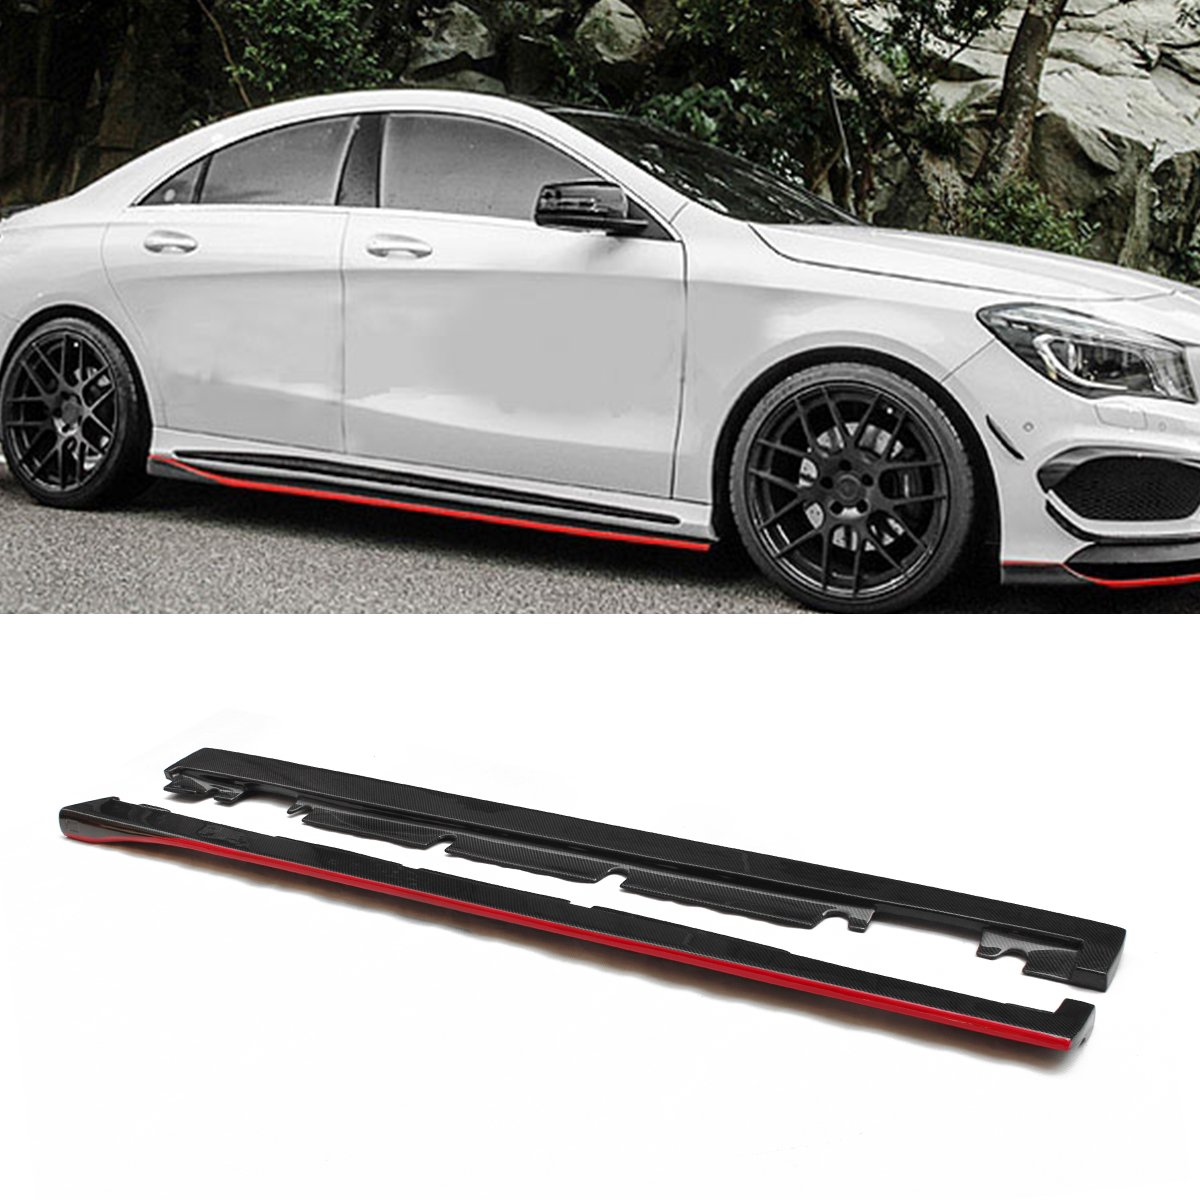 Fandixin W117 Side Skirts Carbon Fiber Side Sills for Mercedes-Benz A Class W176 Sport Edition A45 AMG CLA Class W117 Sport Editon CLA45 AMG